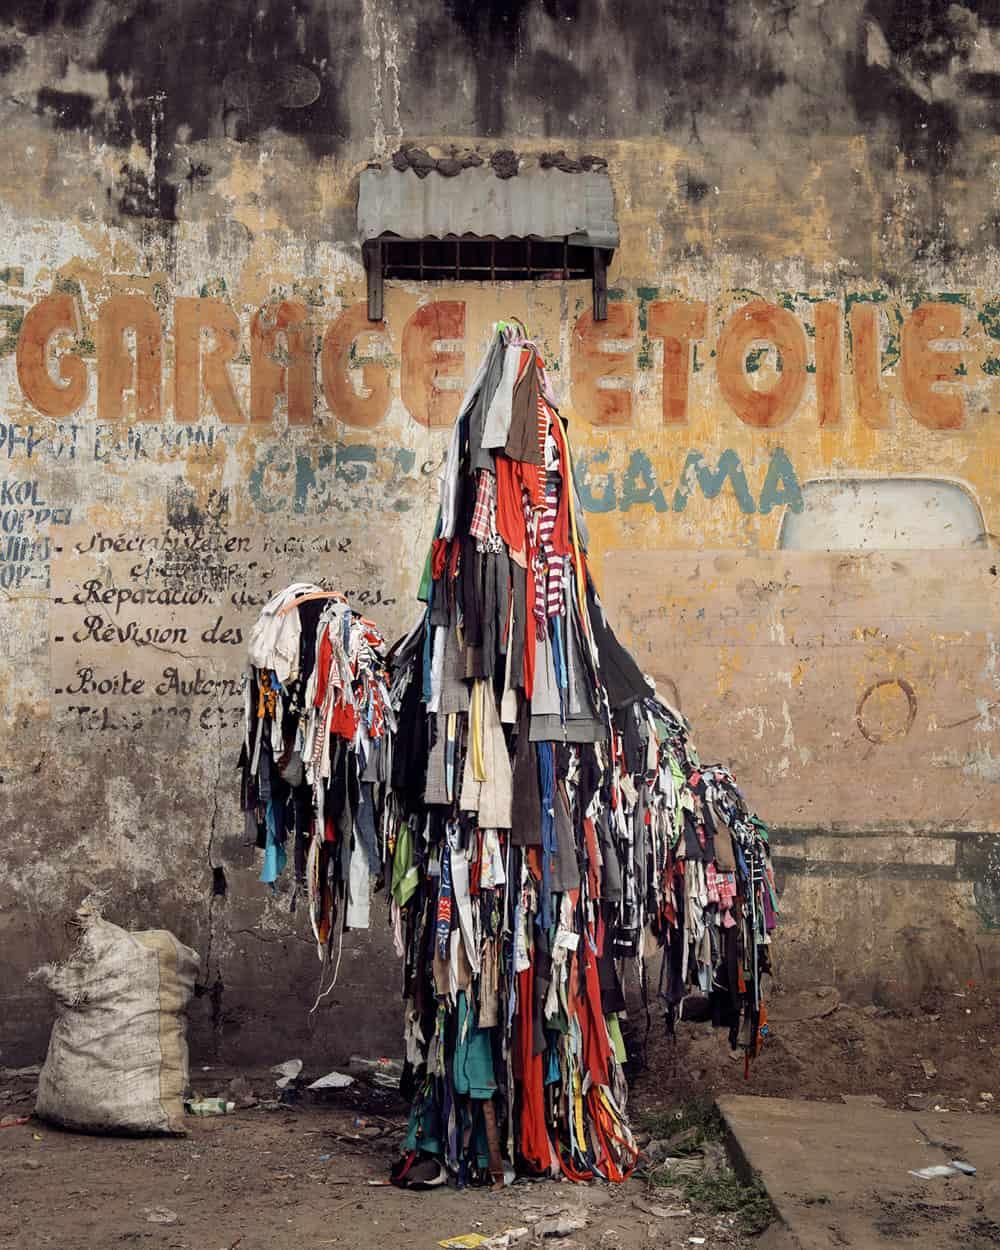 Untitled #15, 2020 Homo Detritus, Real Portraitik #5 Kinshasa, RDC ©Stephan Gladieu